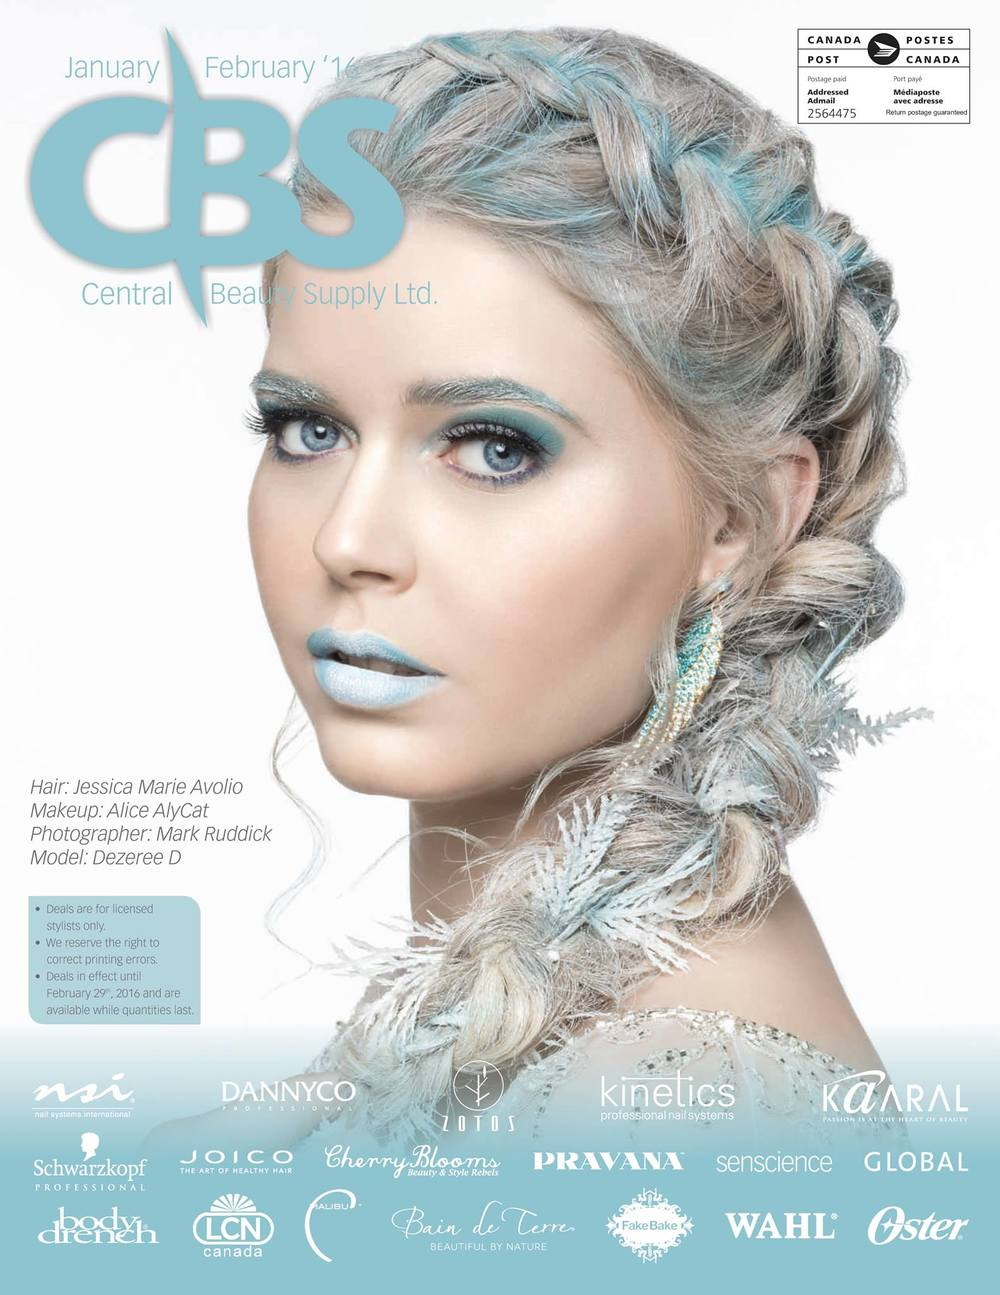 central_beauty_supply.jpg